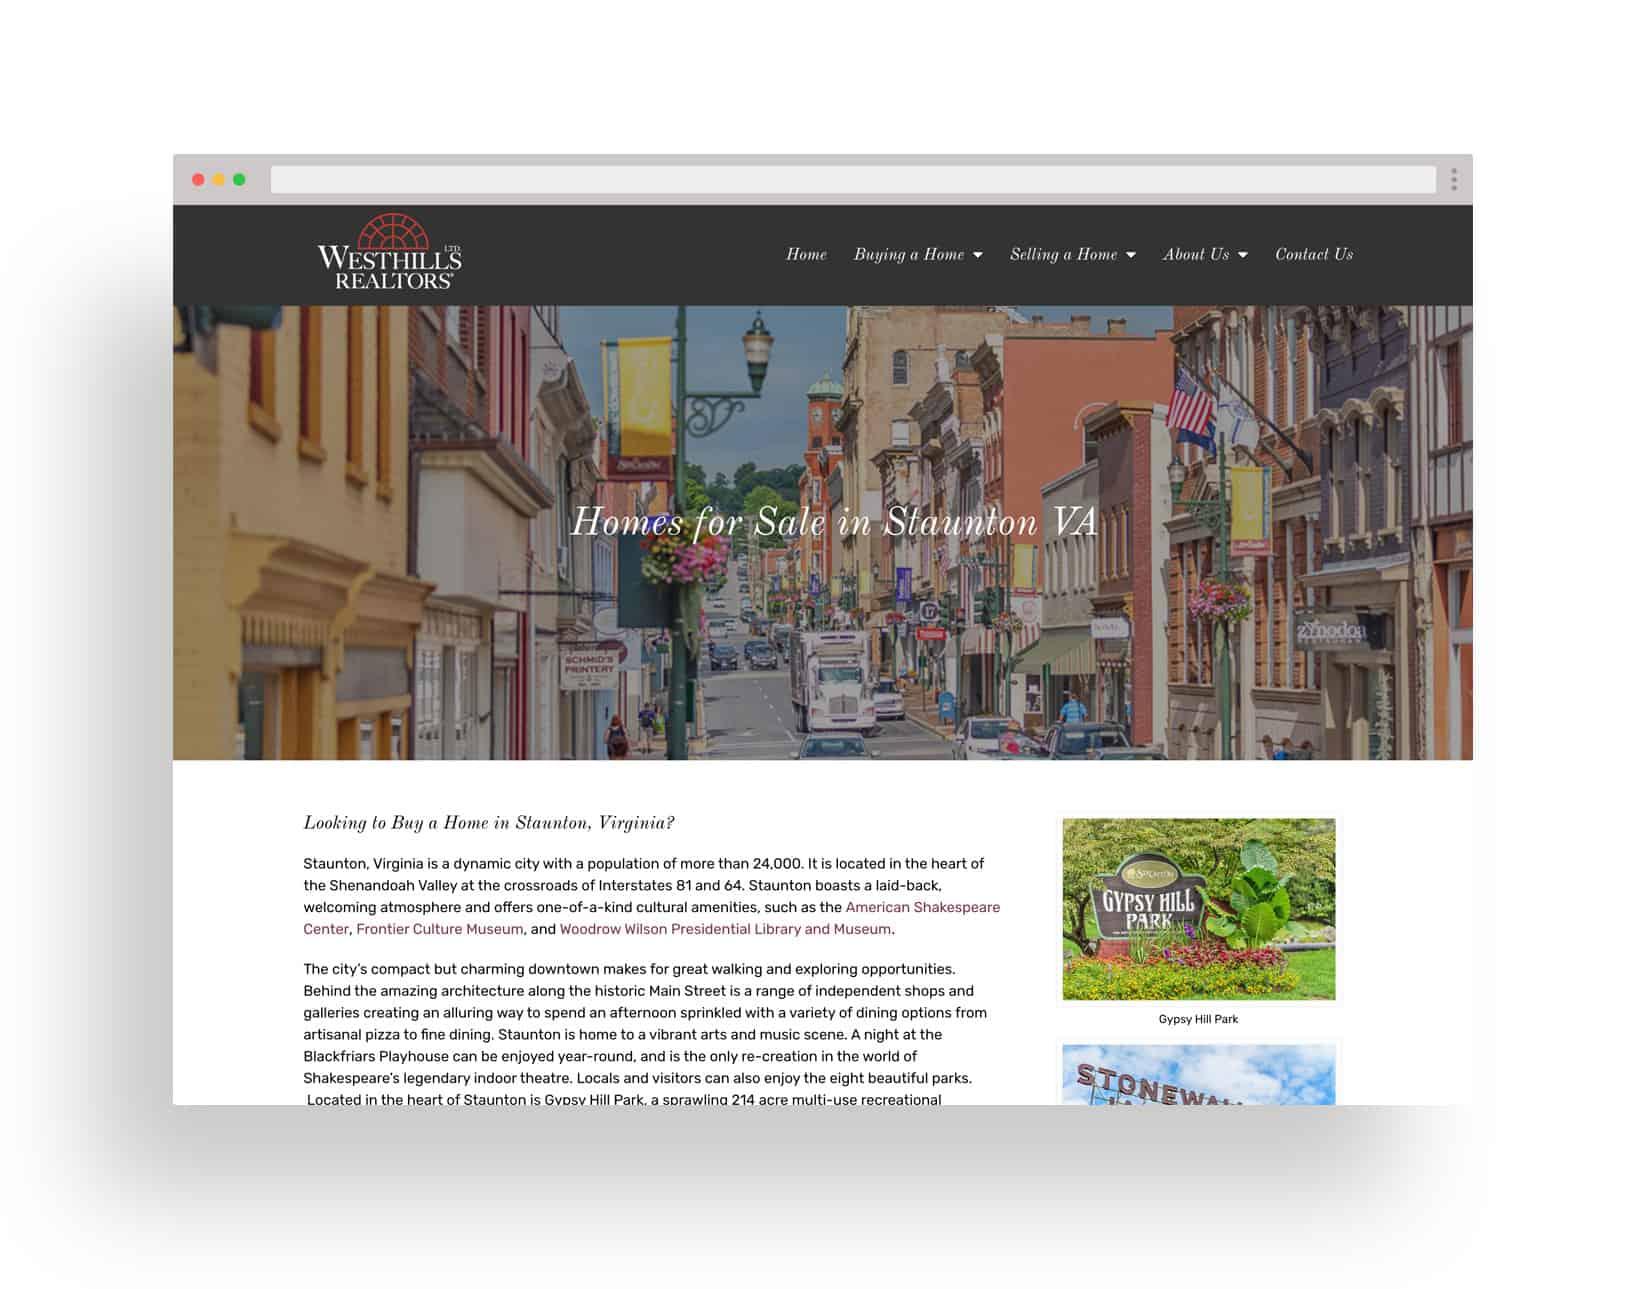 Studio JWAL Web Design Client - Westhills Ltd Realtors